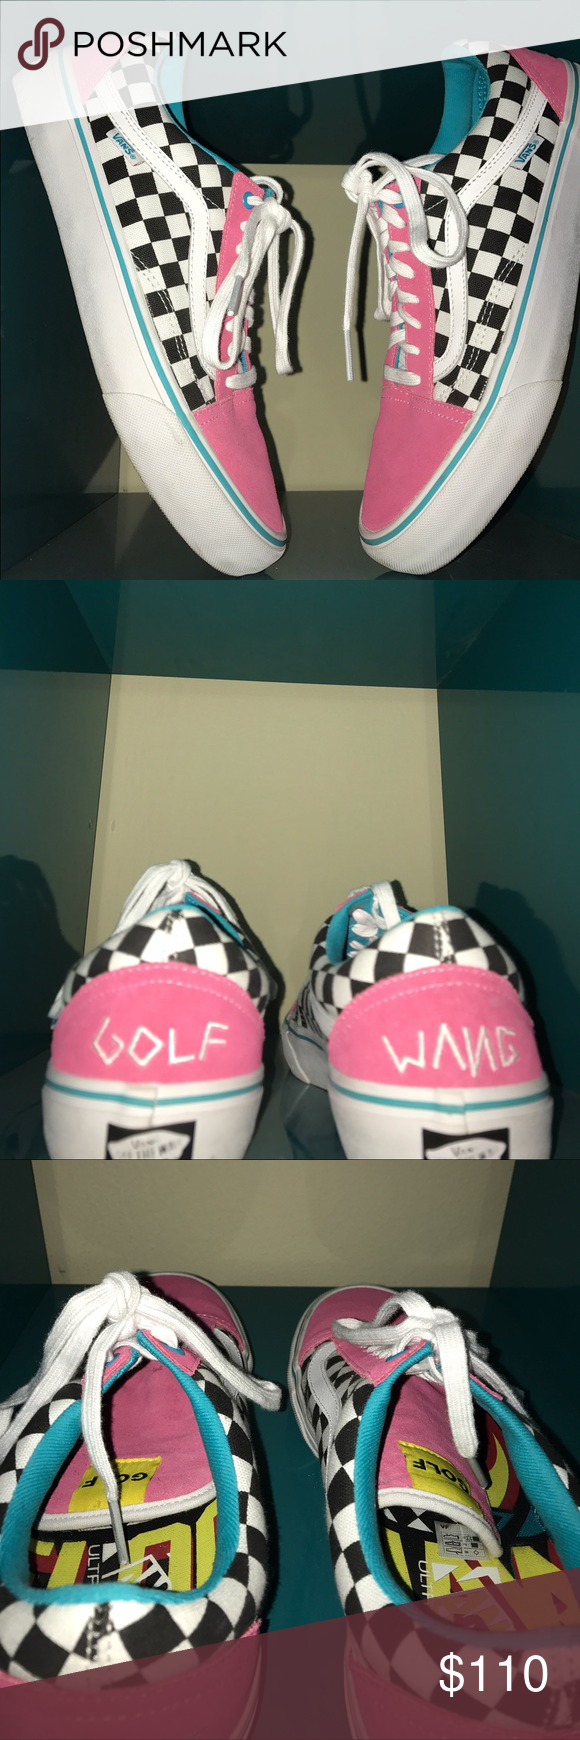 ceb83a20b502 Golf Wang Vans Golf Wang Vans. 9 10 Condition. Size 11. Vans Shoes ...